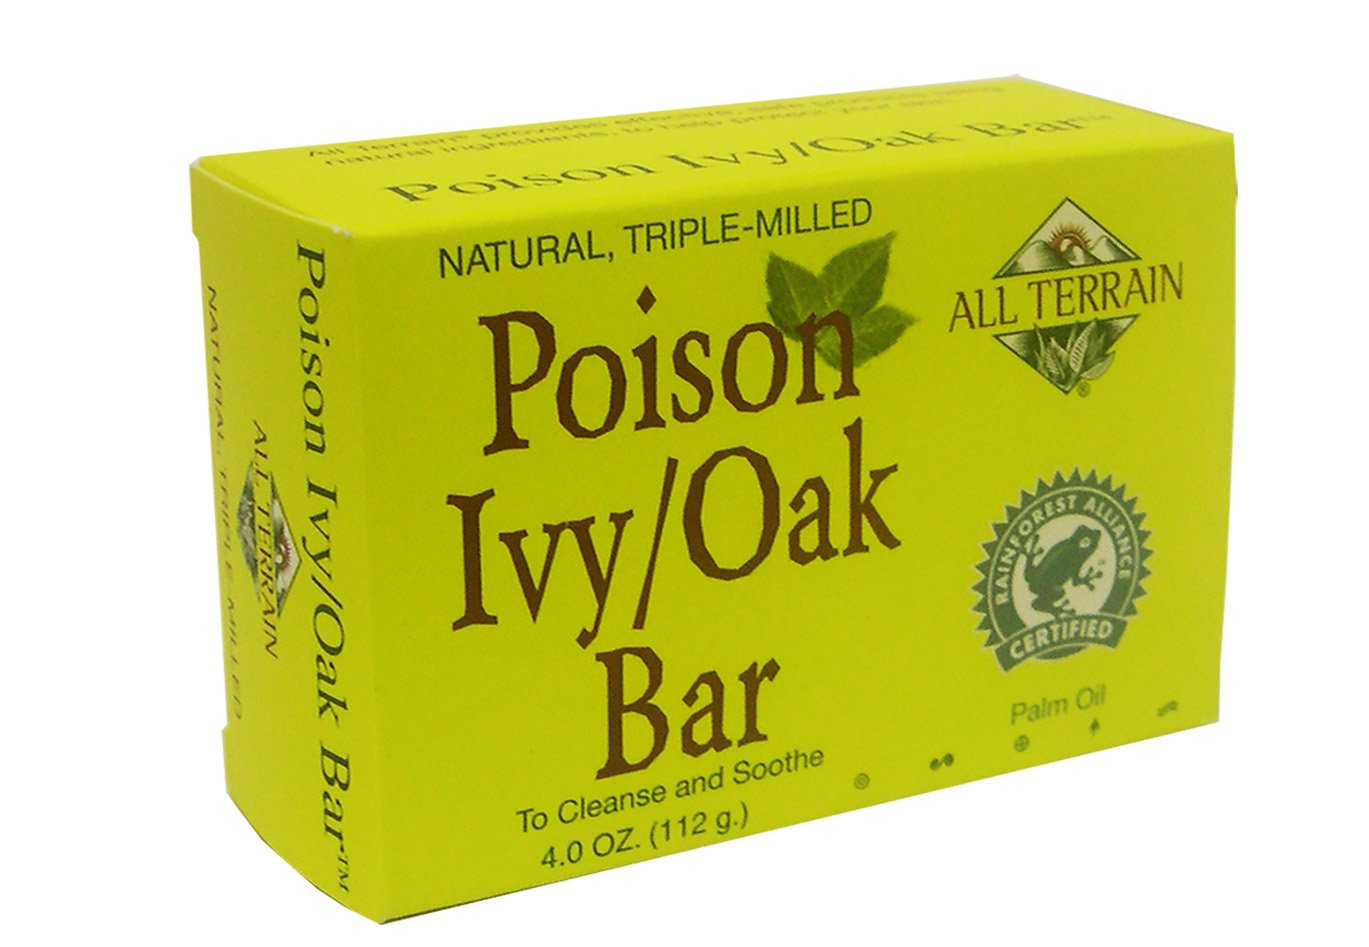 All Terrain Natural Poison Ivy Oak/Bar